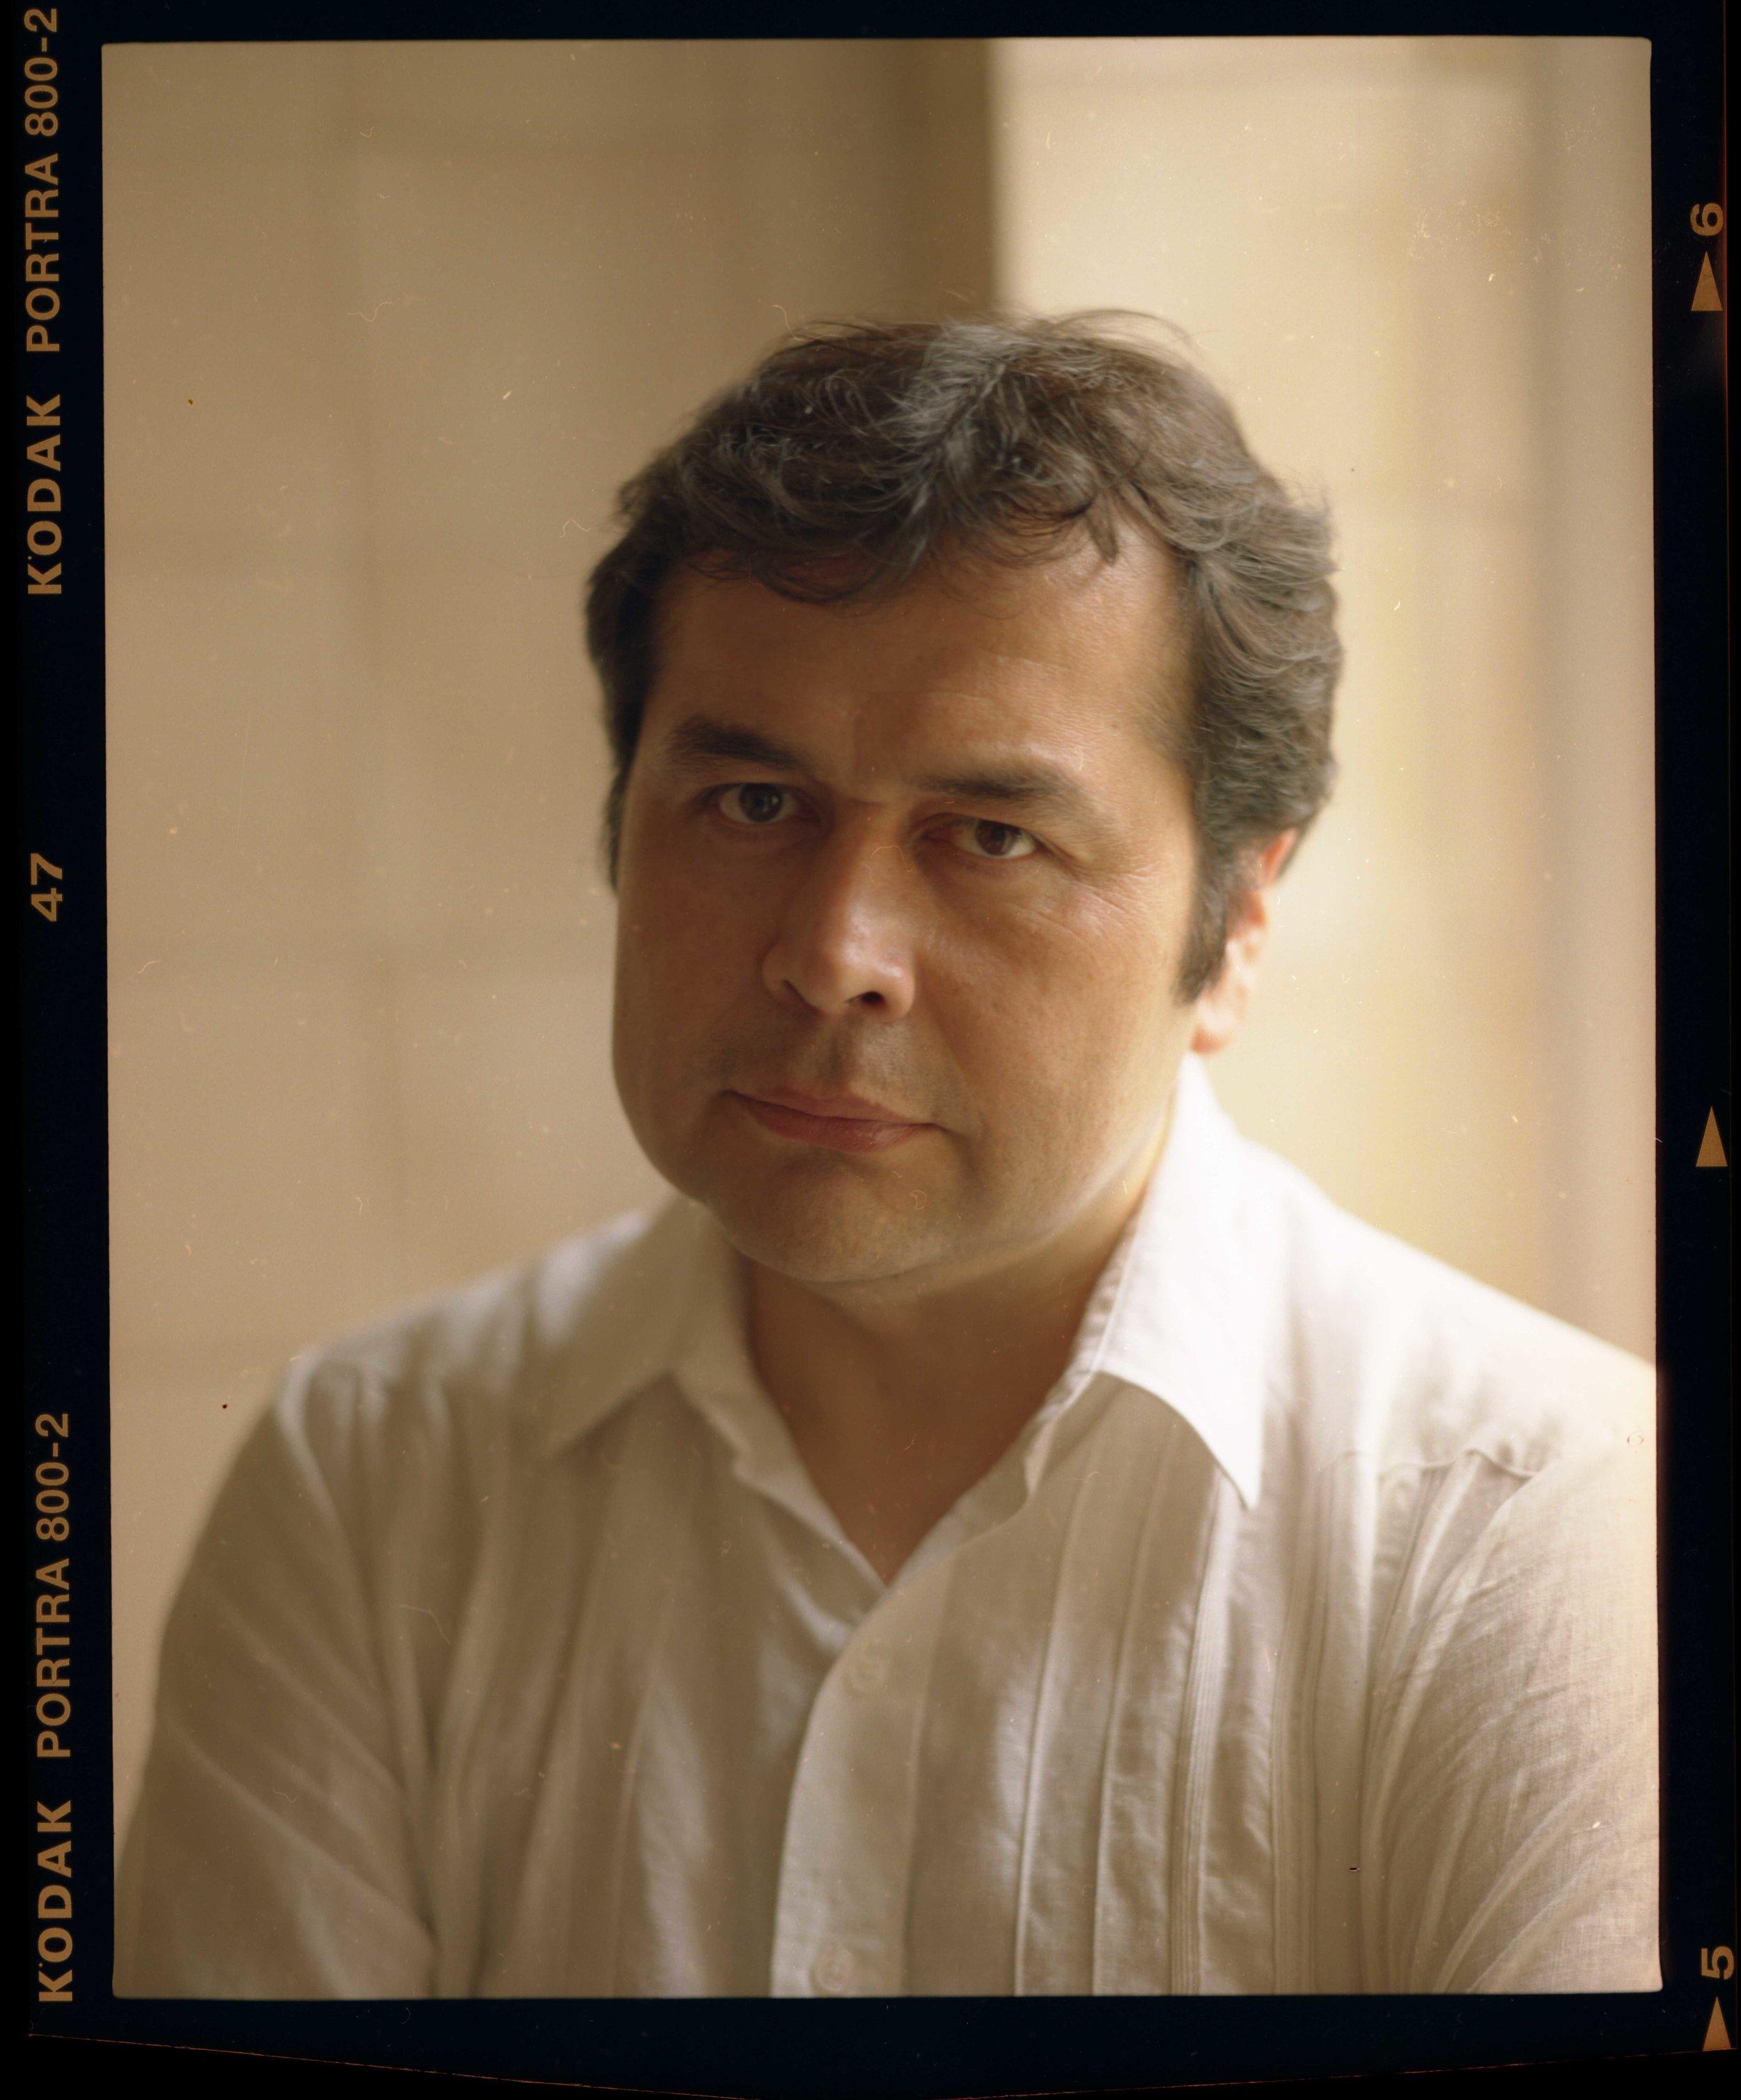 Gonzalo Maza - Screenwriter of A Fantastic Woman & Gloria